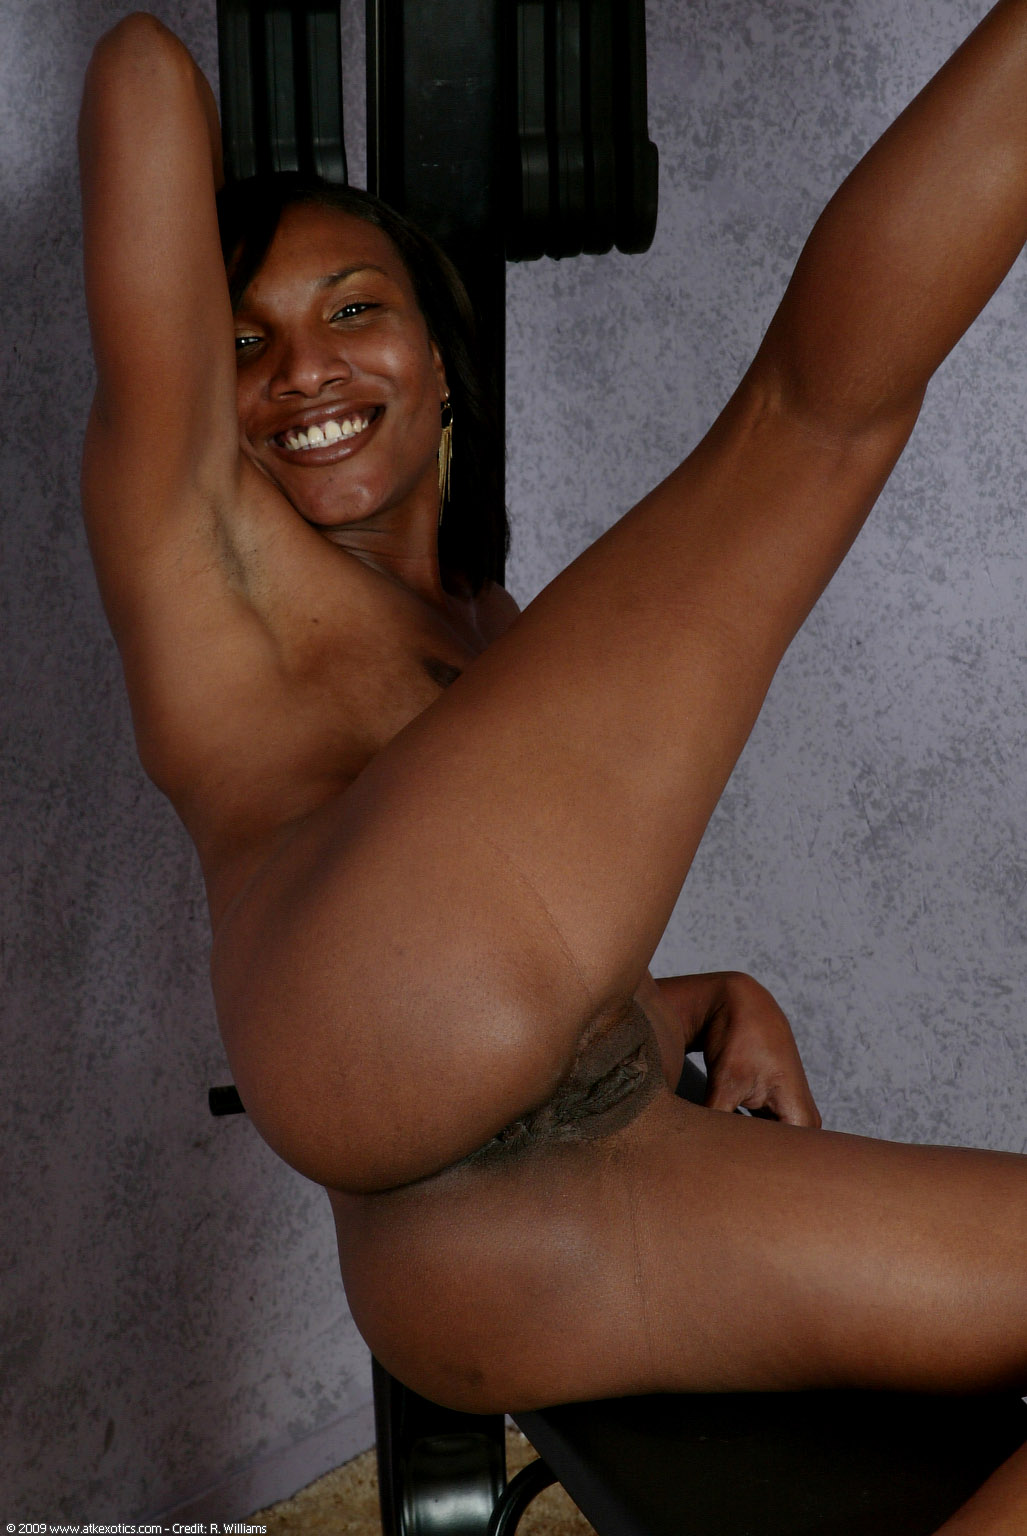 Denise from atk exotics